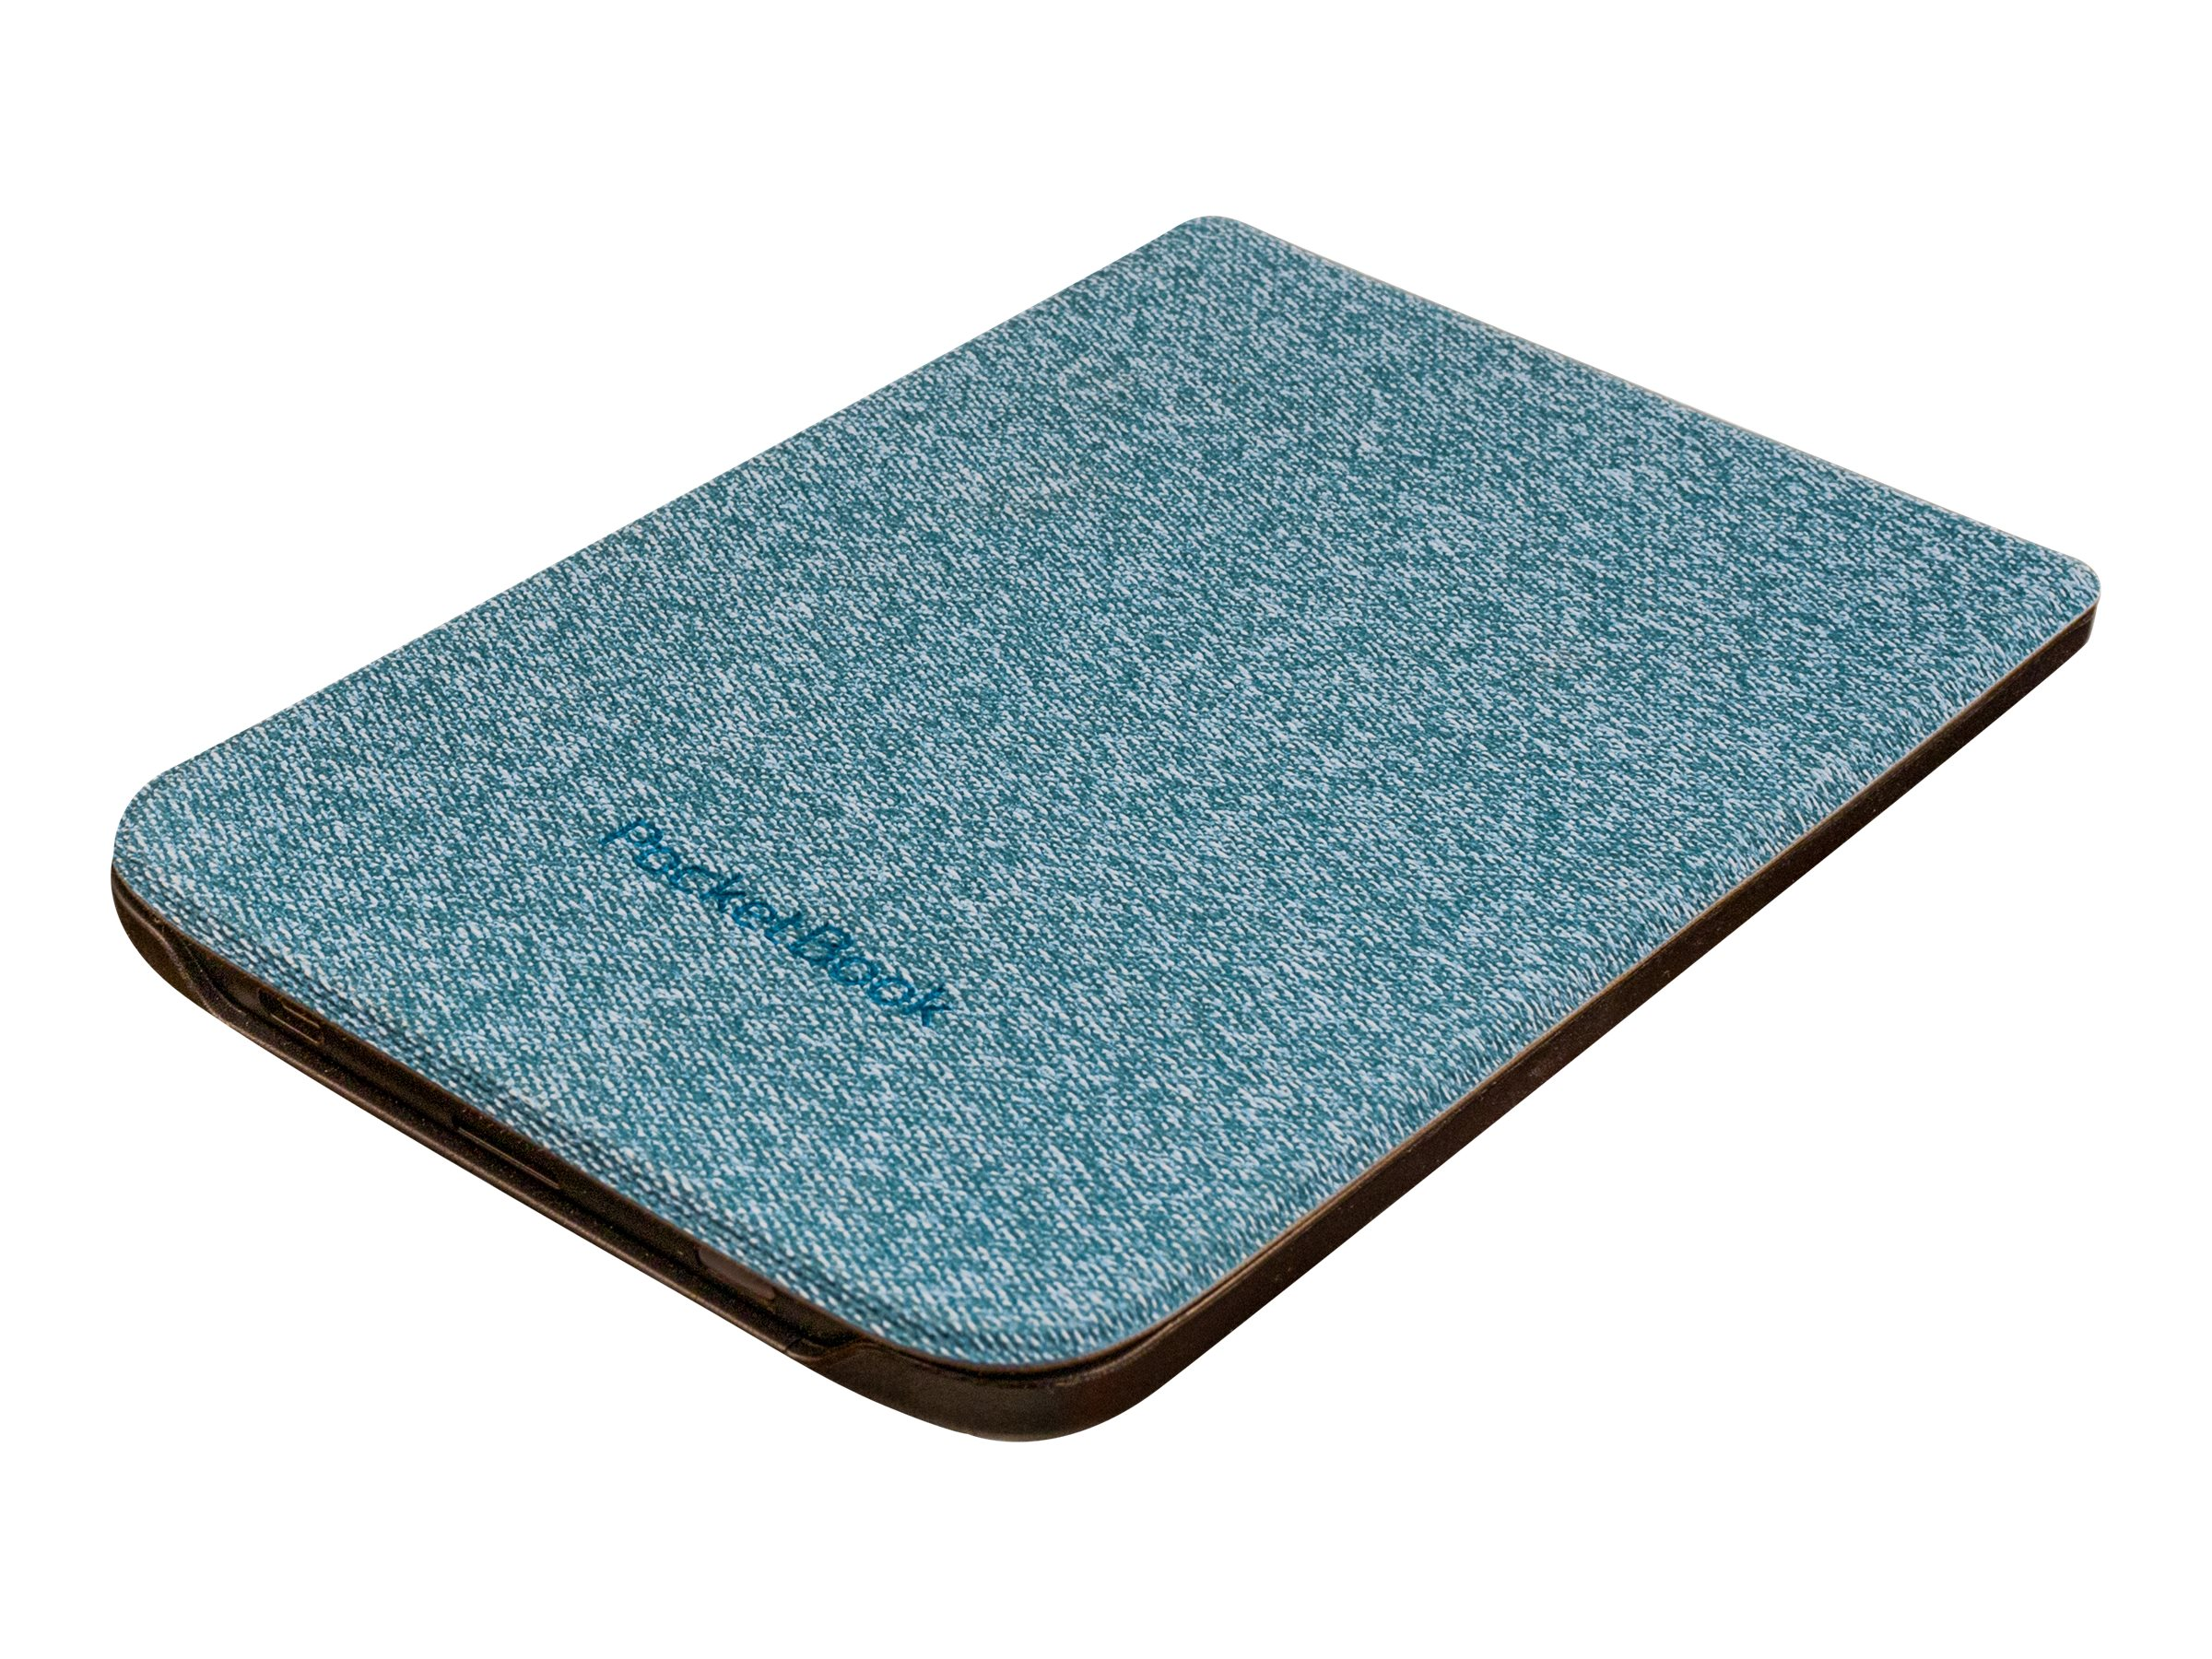 PocketBook Shell series - Flip-Hülle für eBook-Reader - Kunststoff, Polyurethan, Microfiber - Blau - für PocketBook Basic Lux 2,